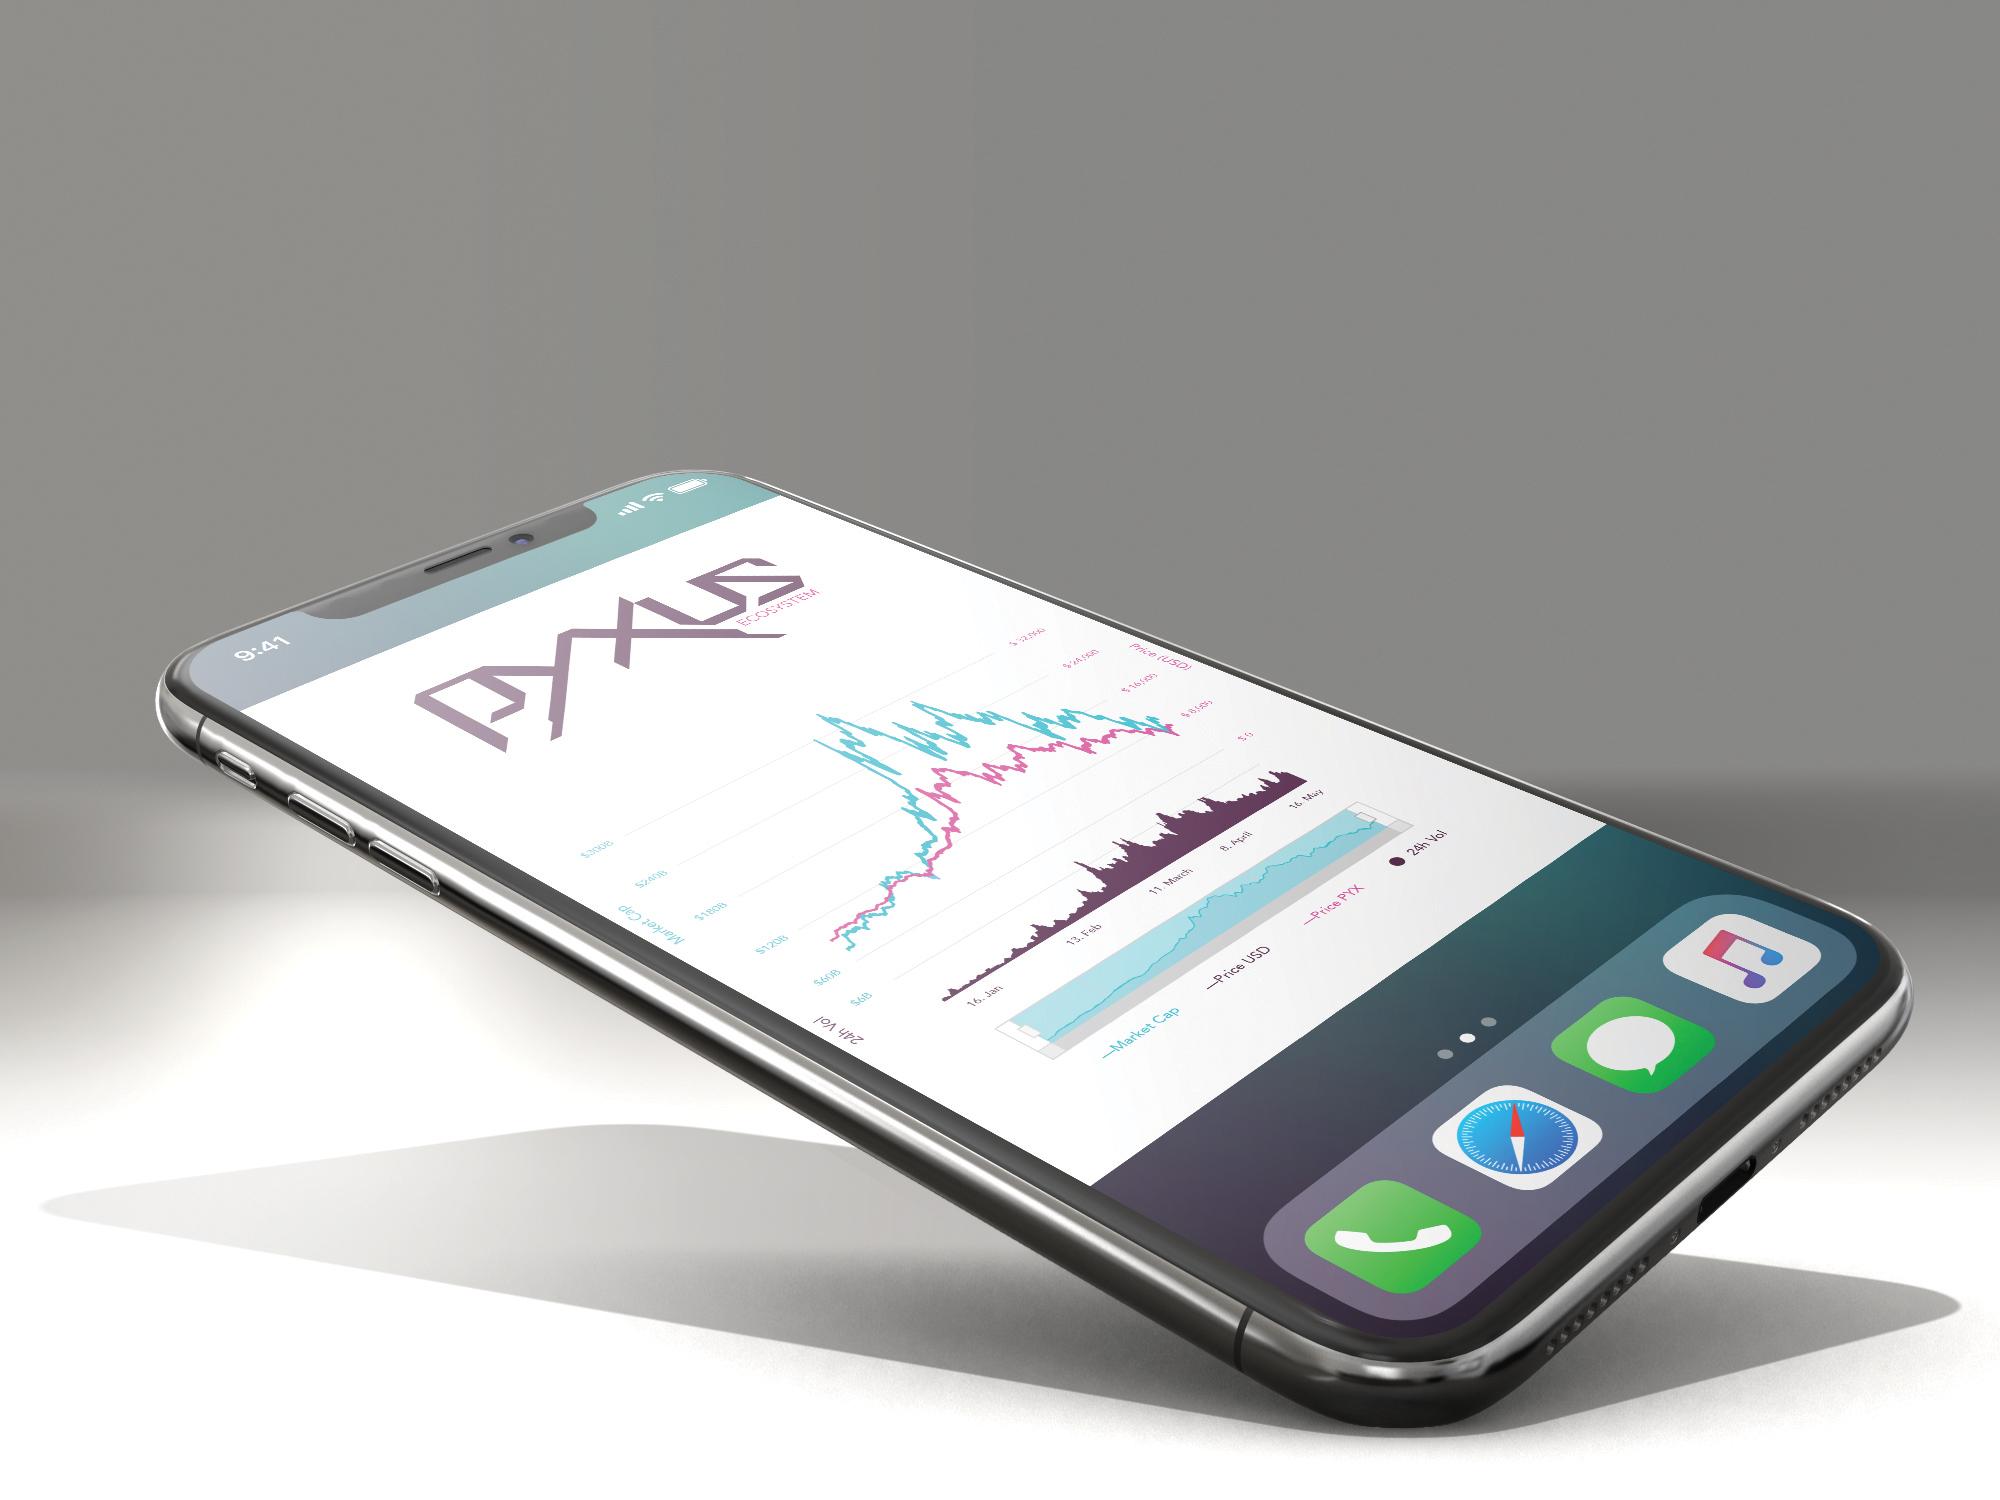 PYXUS_iPhone.jpg